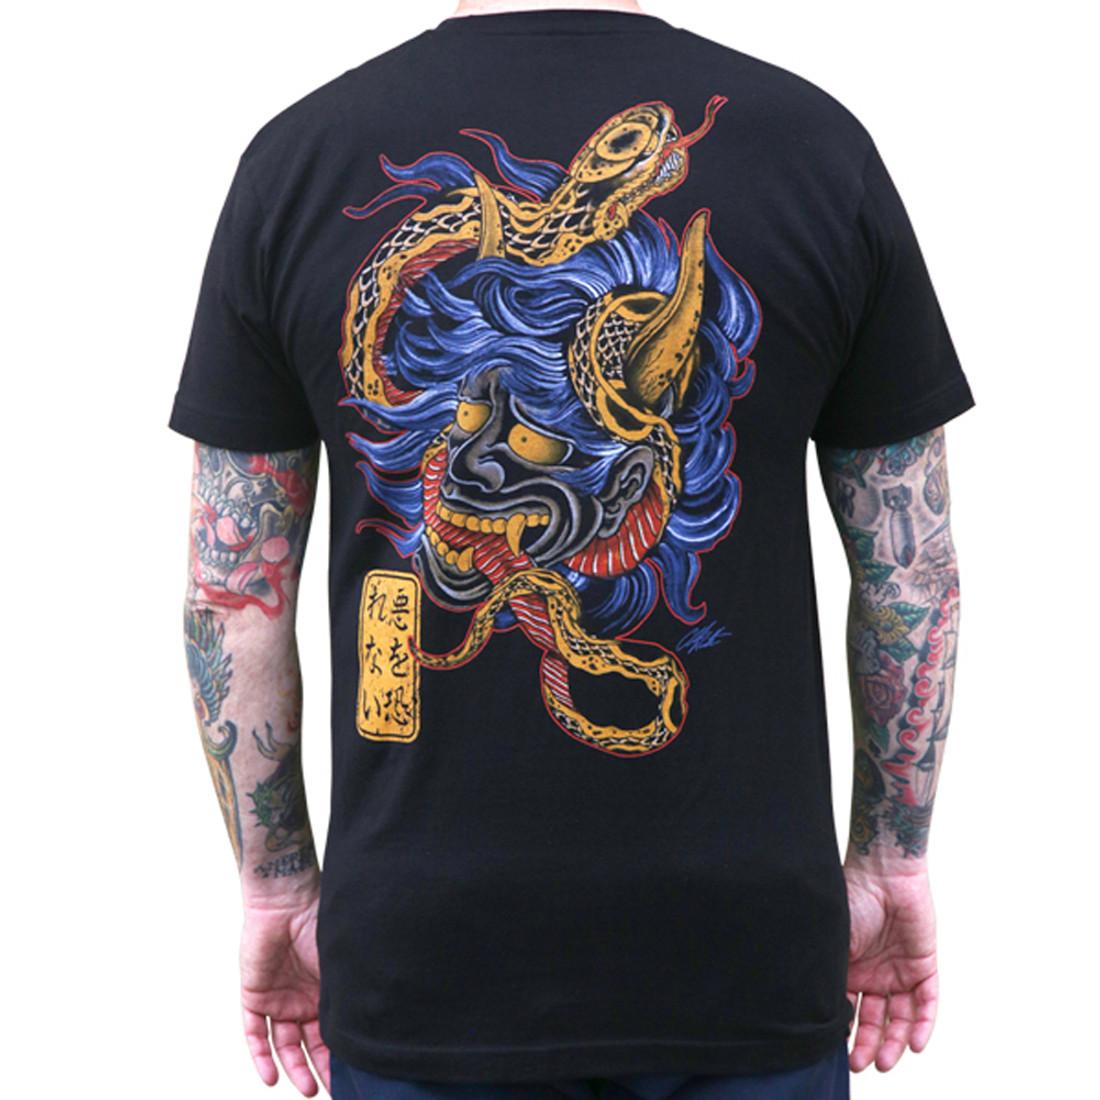 Scorned by Clark North Hannya Mask Men's Black Tee Shirt